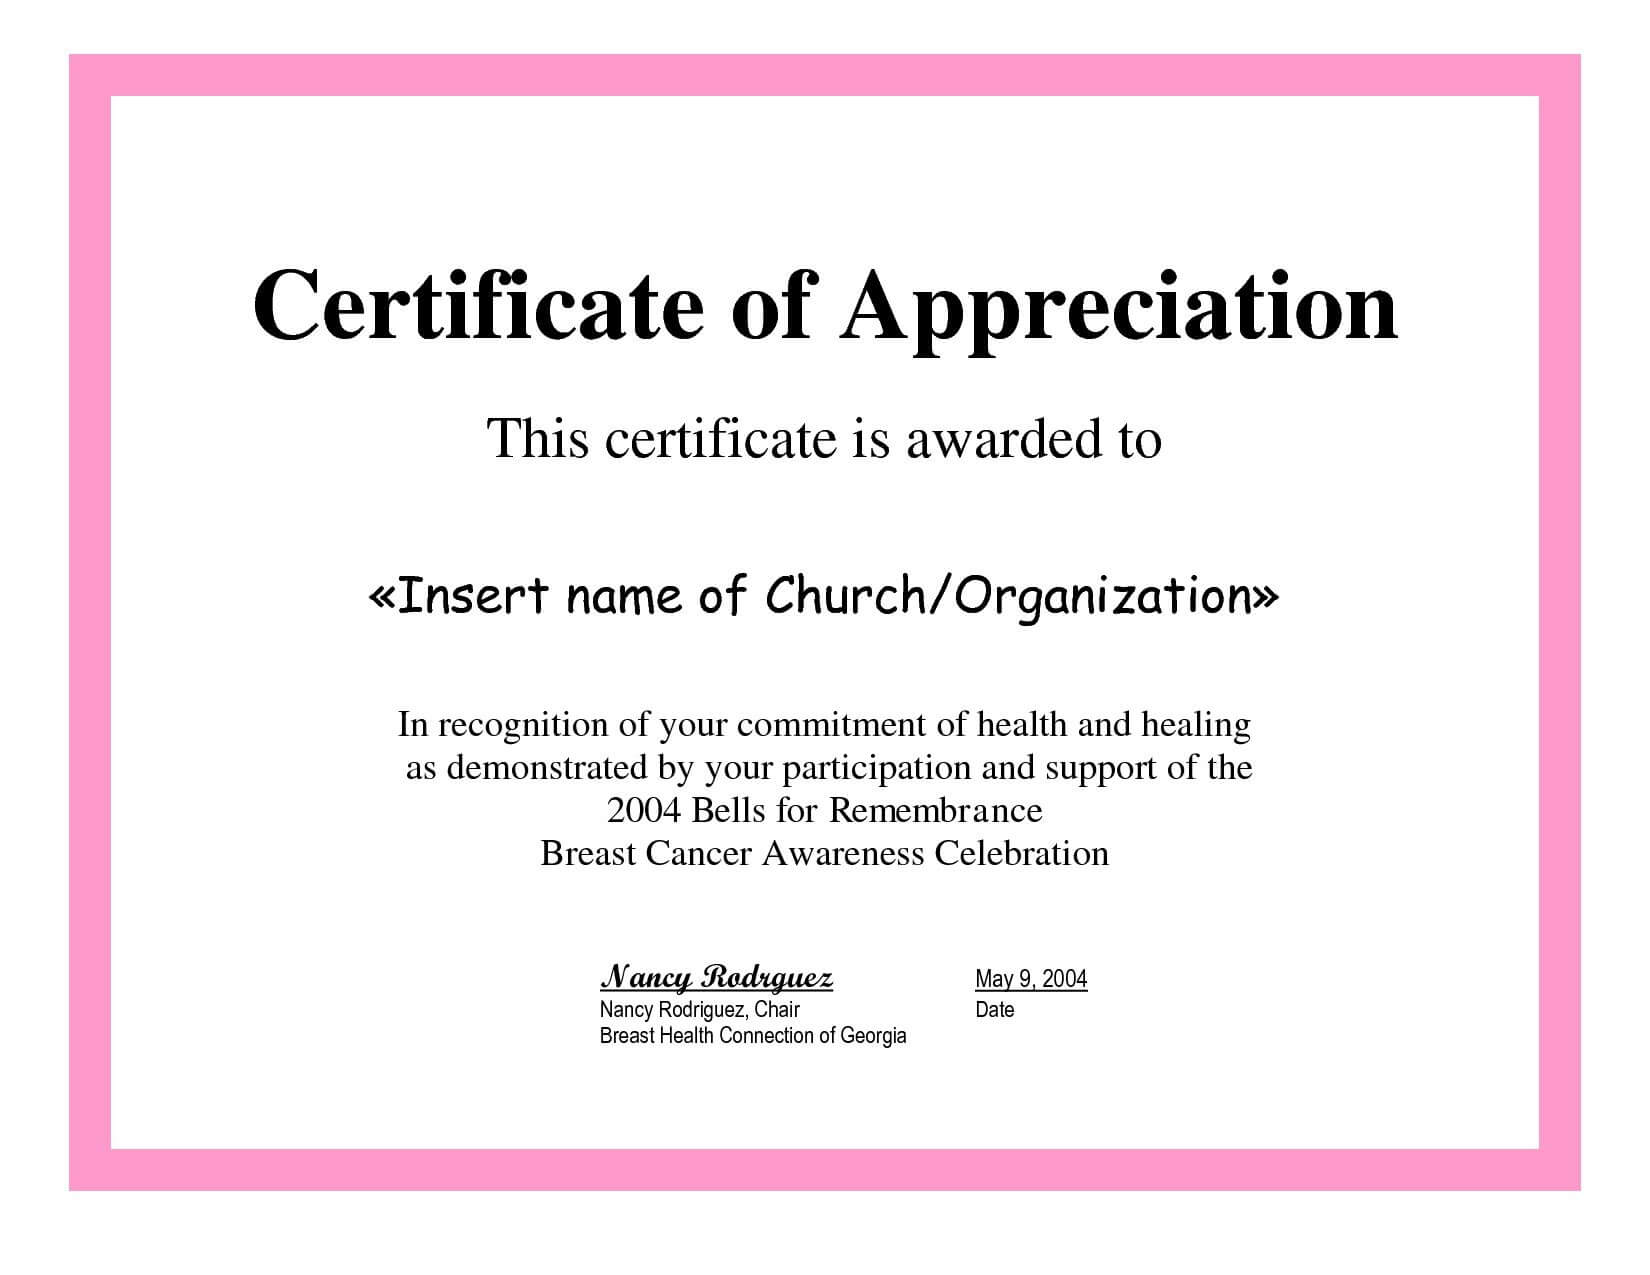 Farewell Certificate Template - Atlantaauctionco Pertaining To Farewell Certificate Template